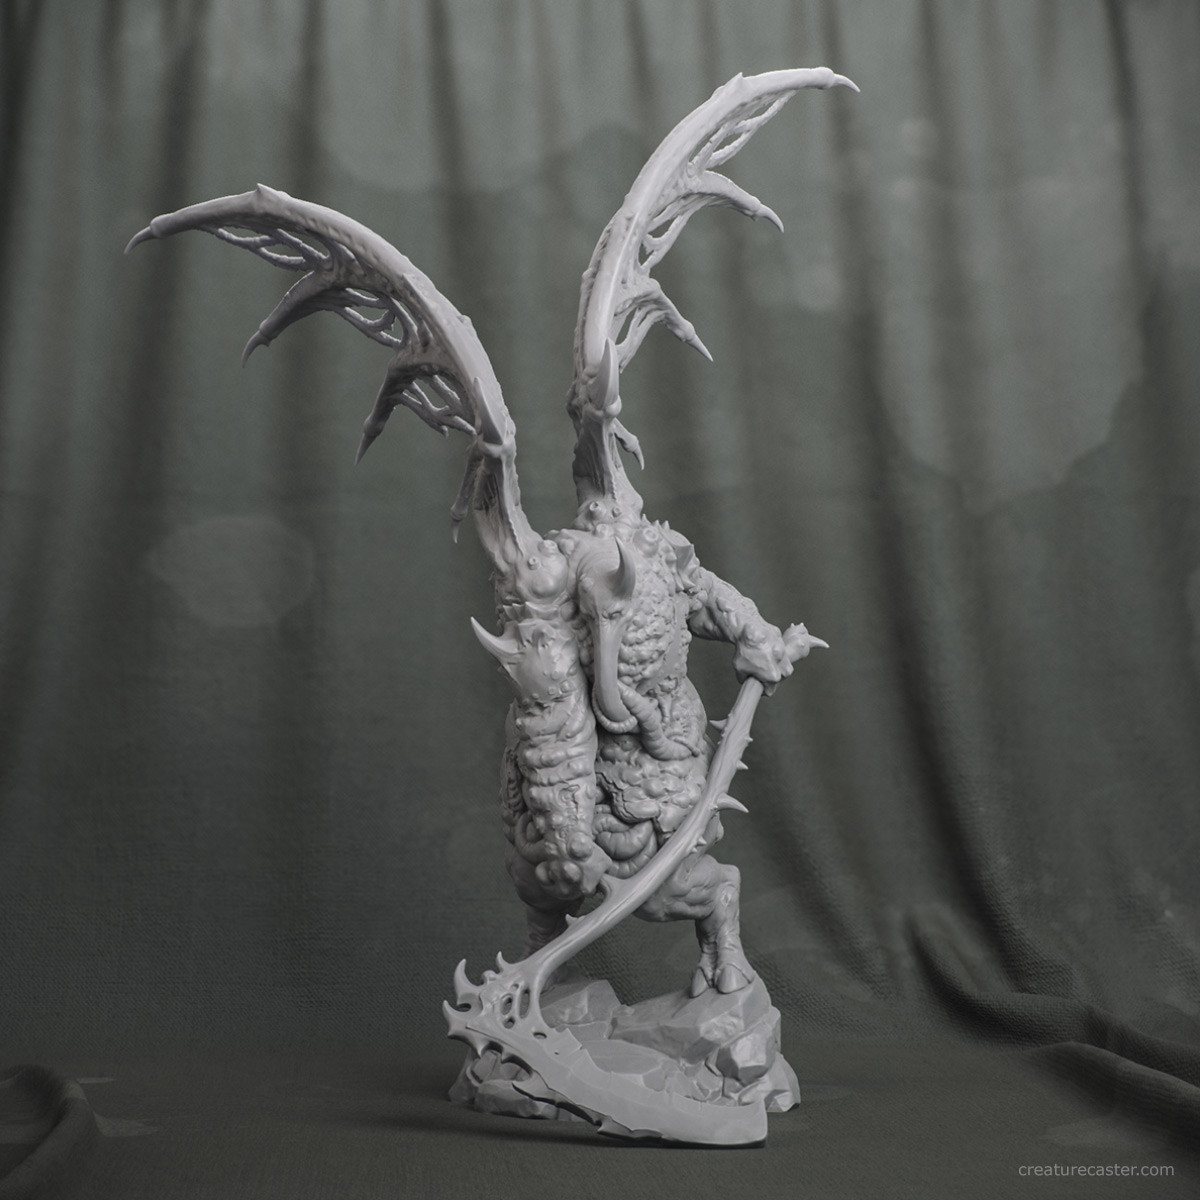 Martin nikolov render clay01